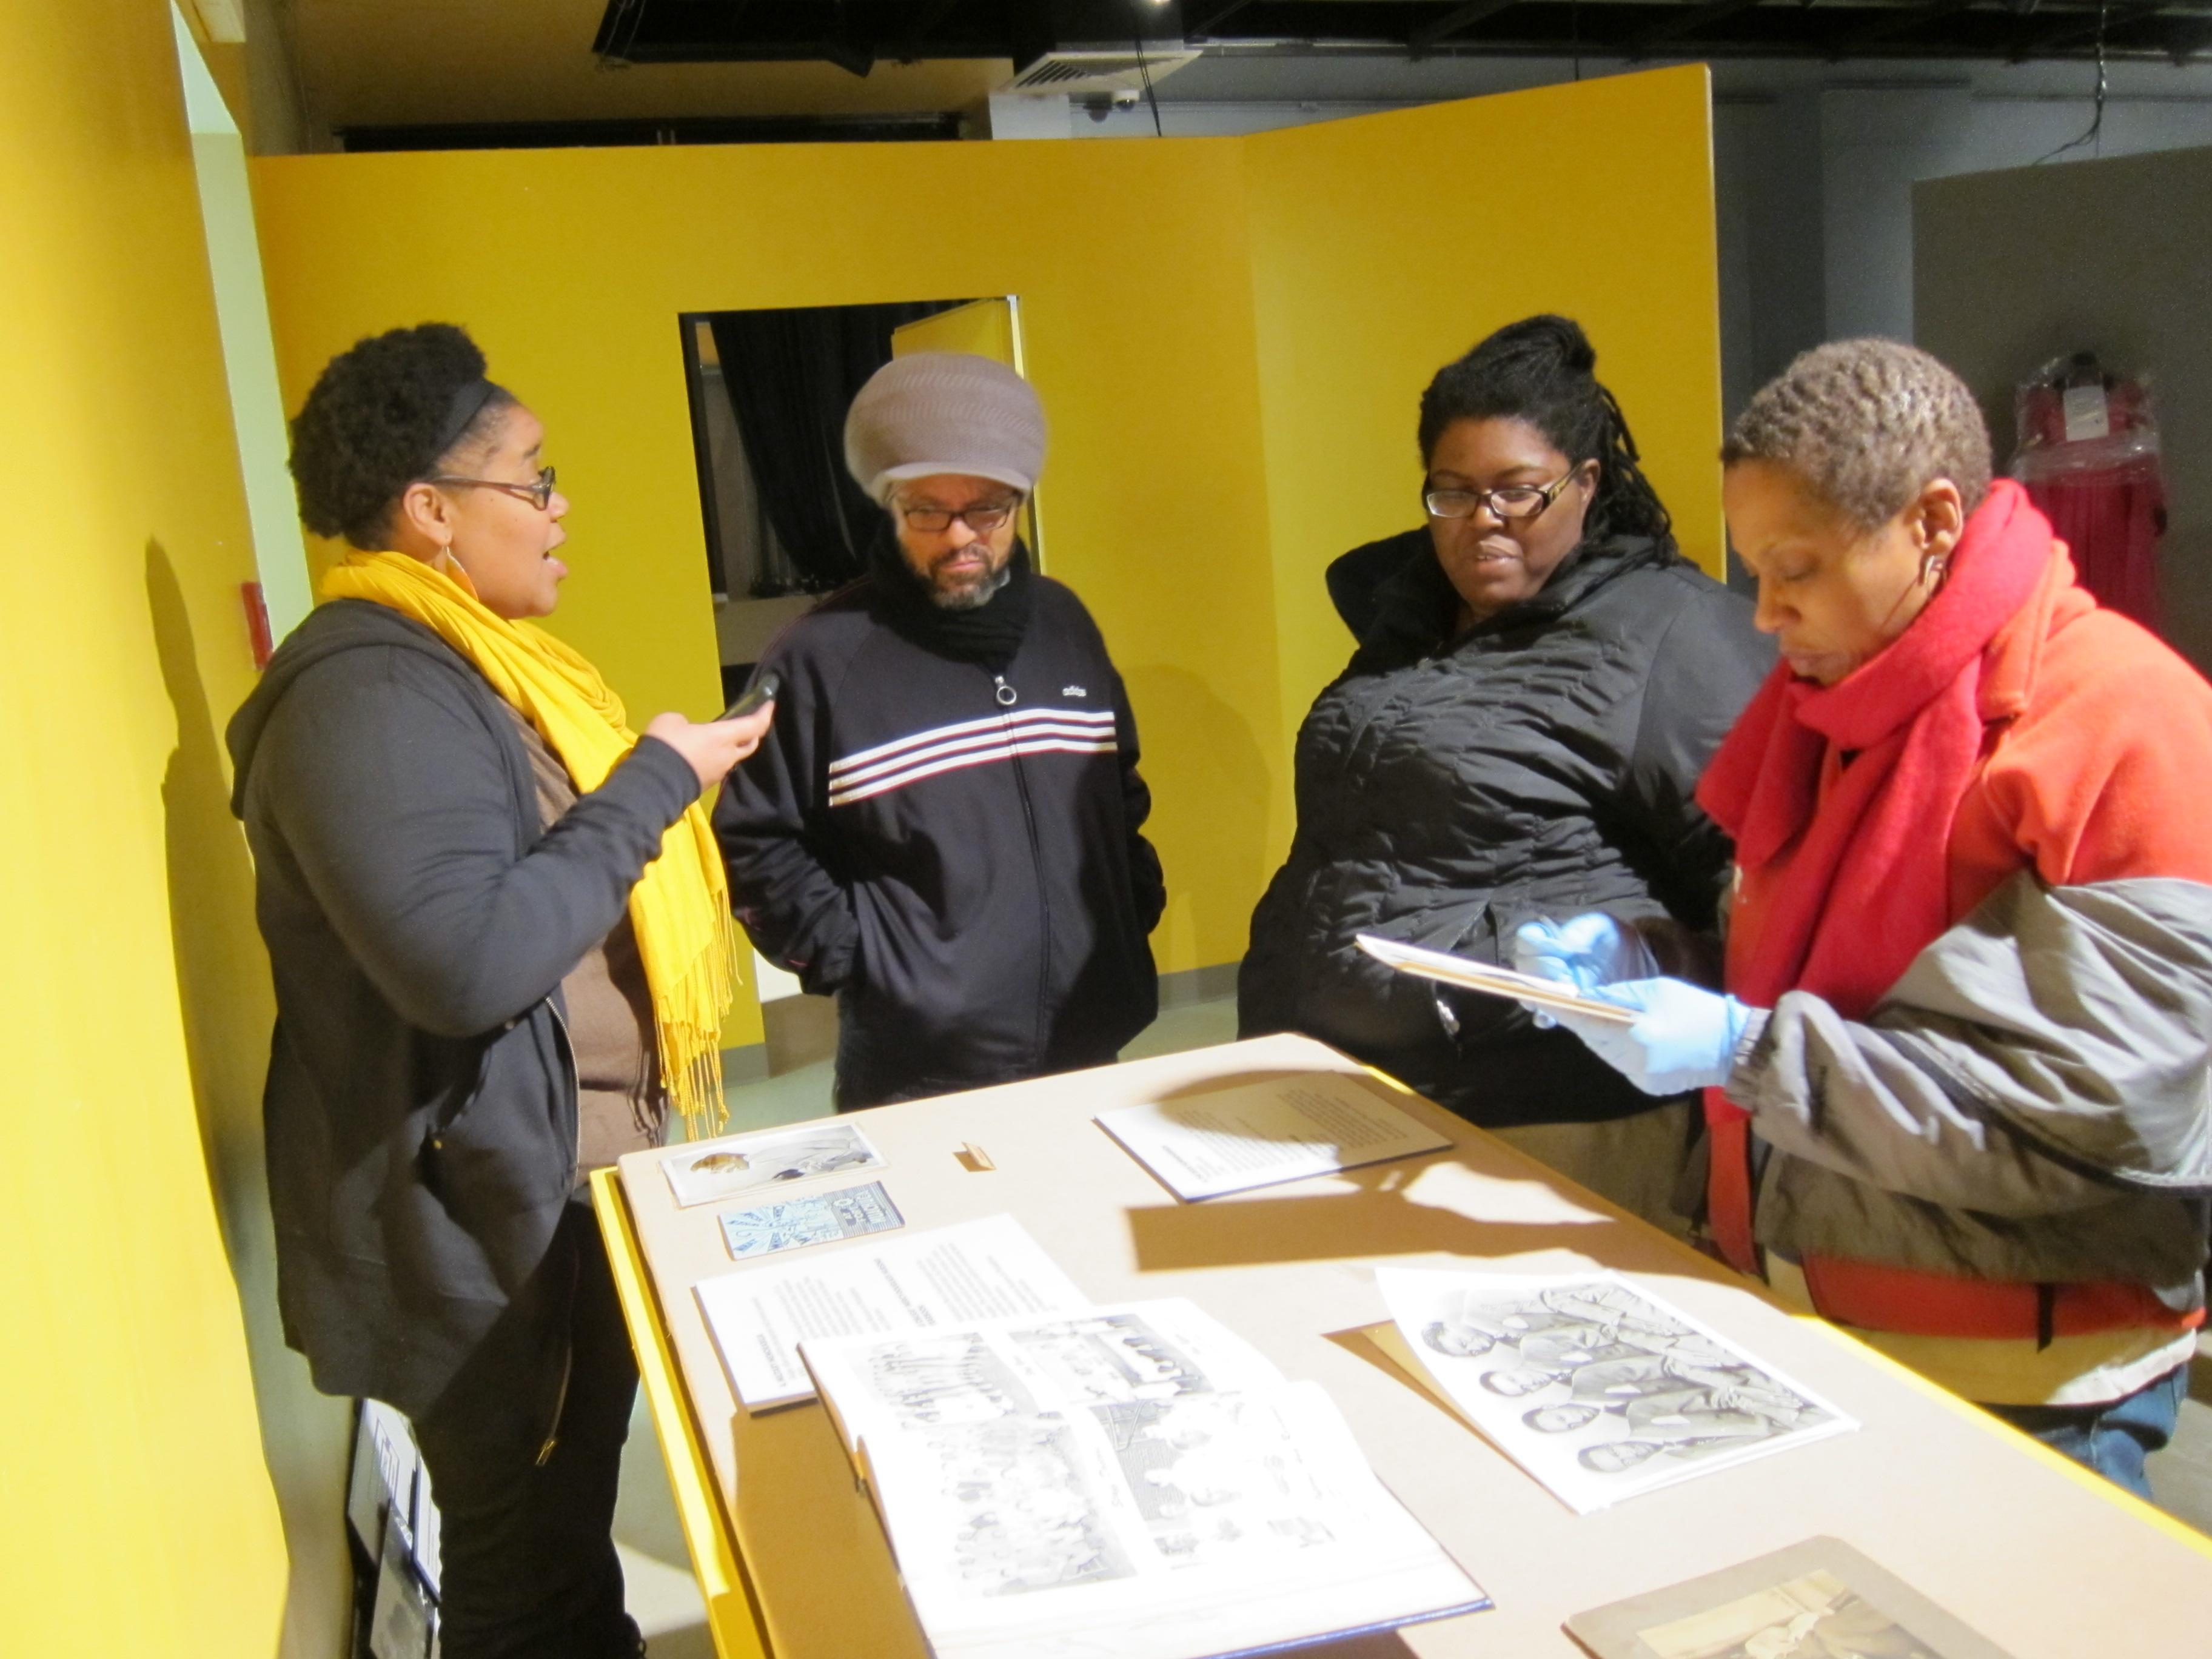 AAMP curatorial assistants working on the exhibit